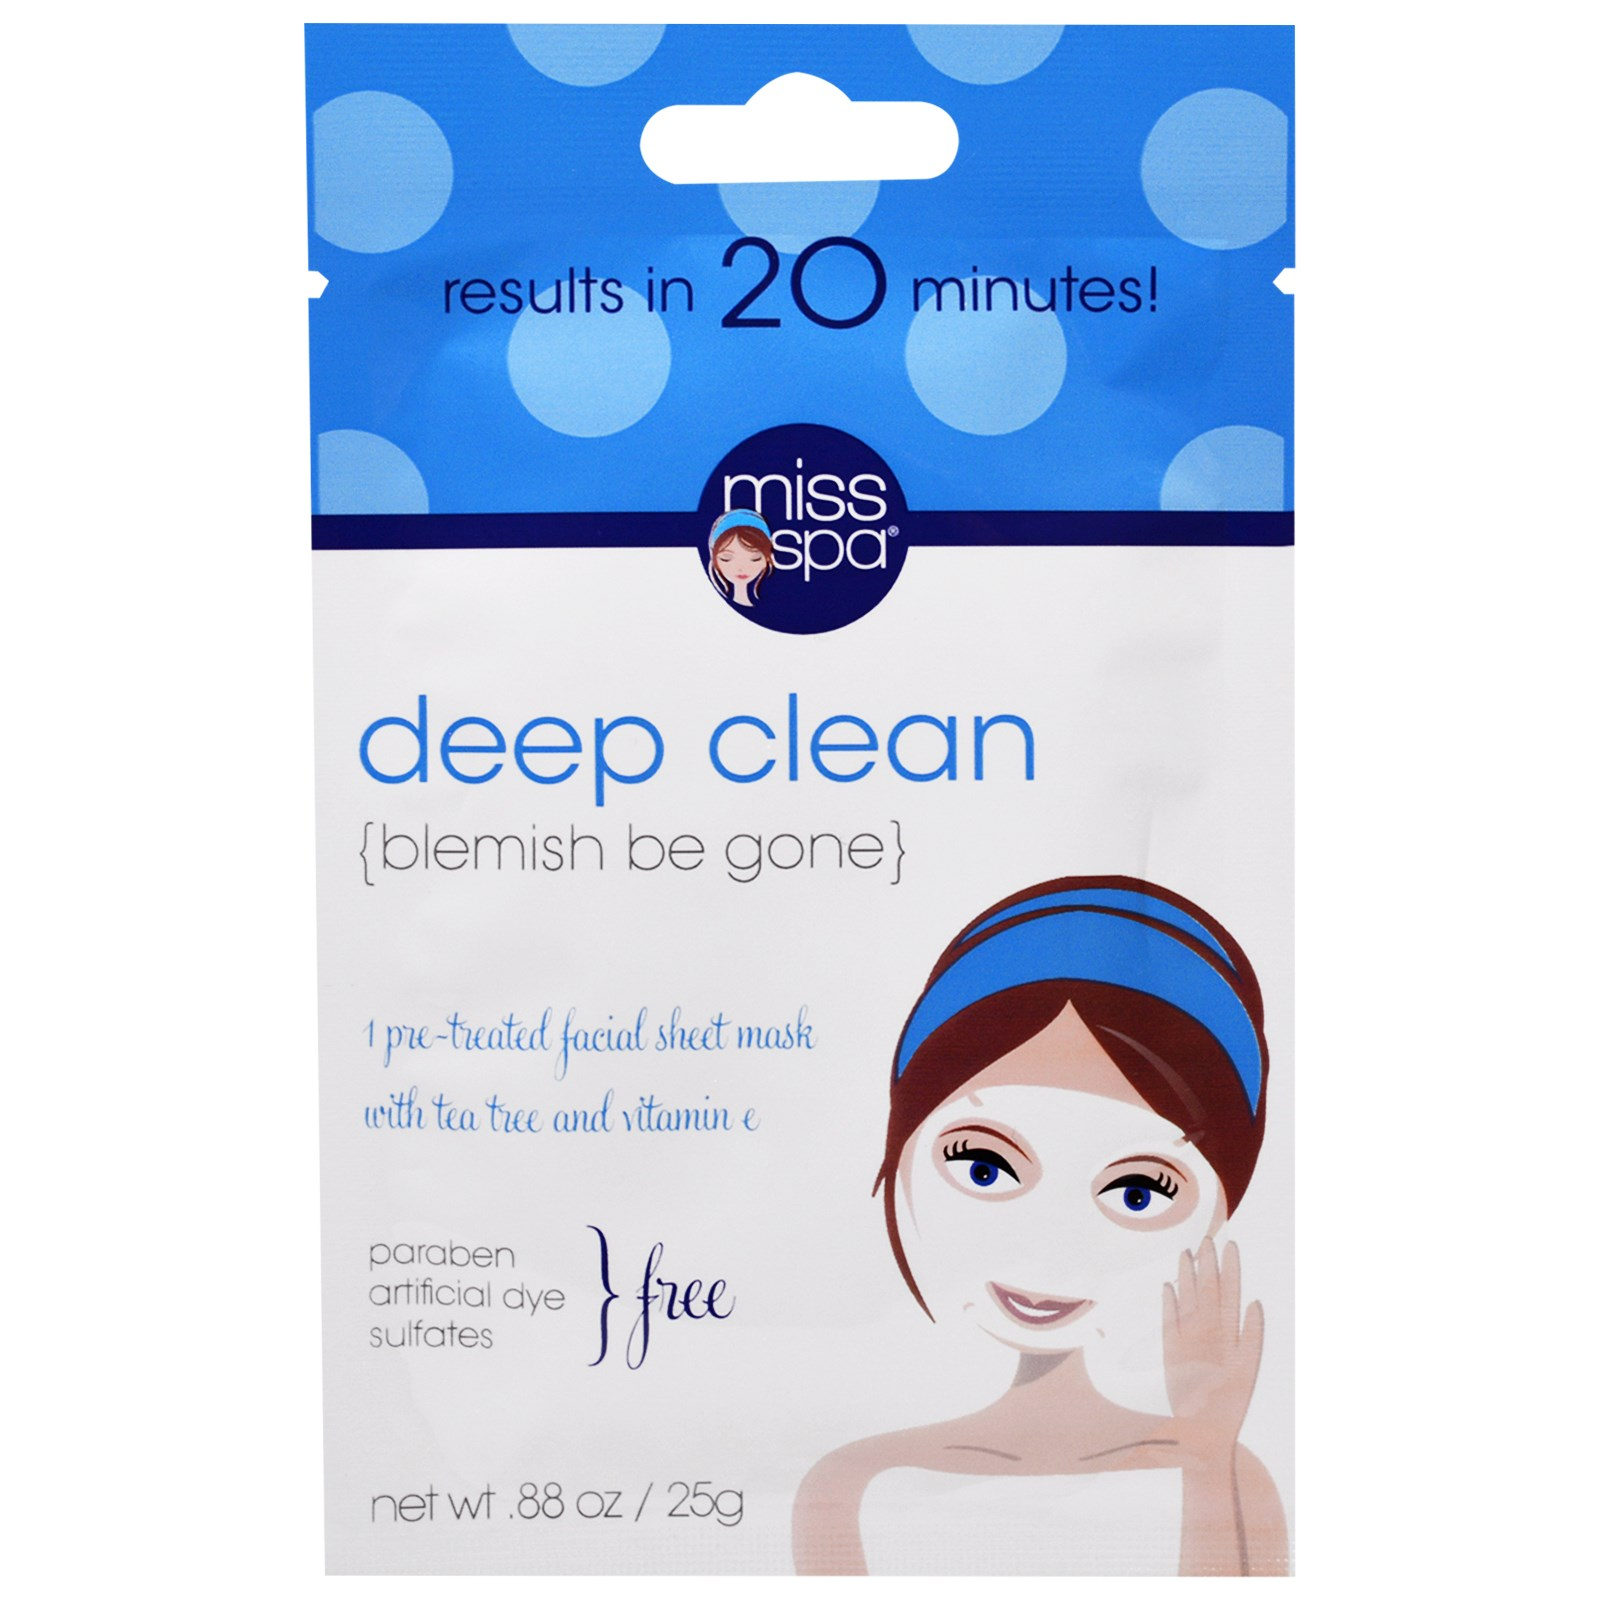 Miss Spa Brighten Pre-Treated Facial Sheet Mask, 0.88 oz Guinot Radiance Renewal Cream 50ml/1.7oz